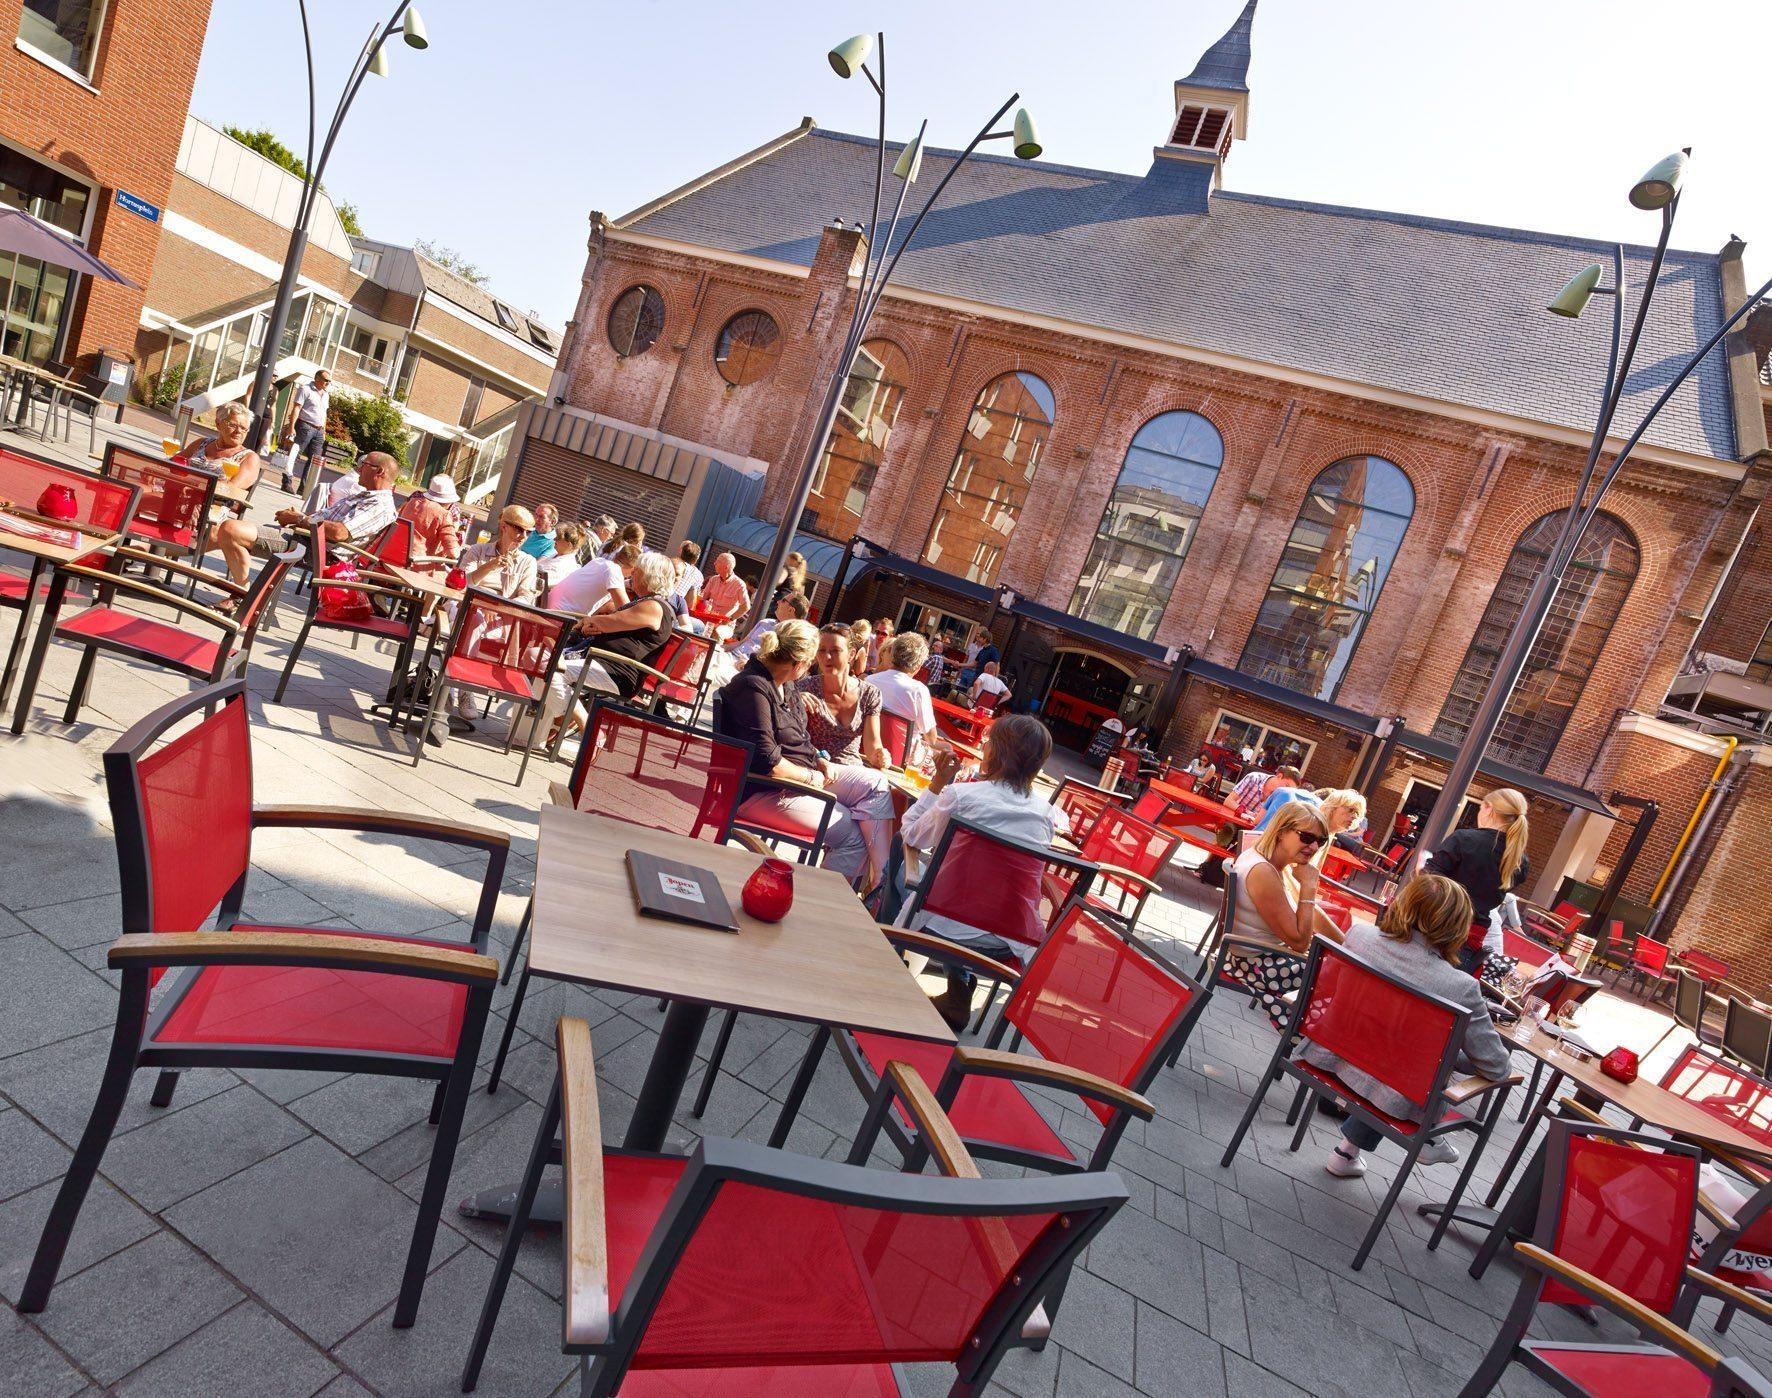 Foto 39 s jopenkerk haarlem - Buitenkant terras design ...